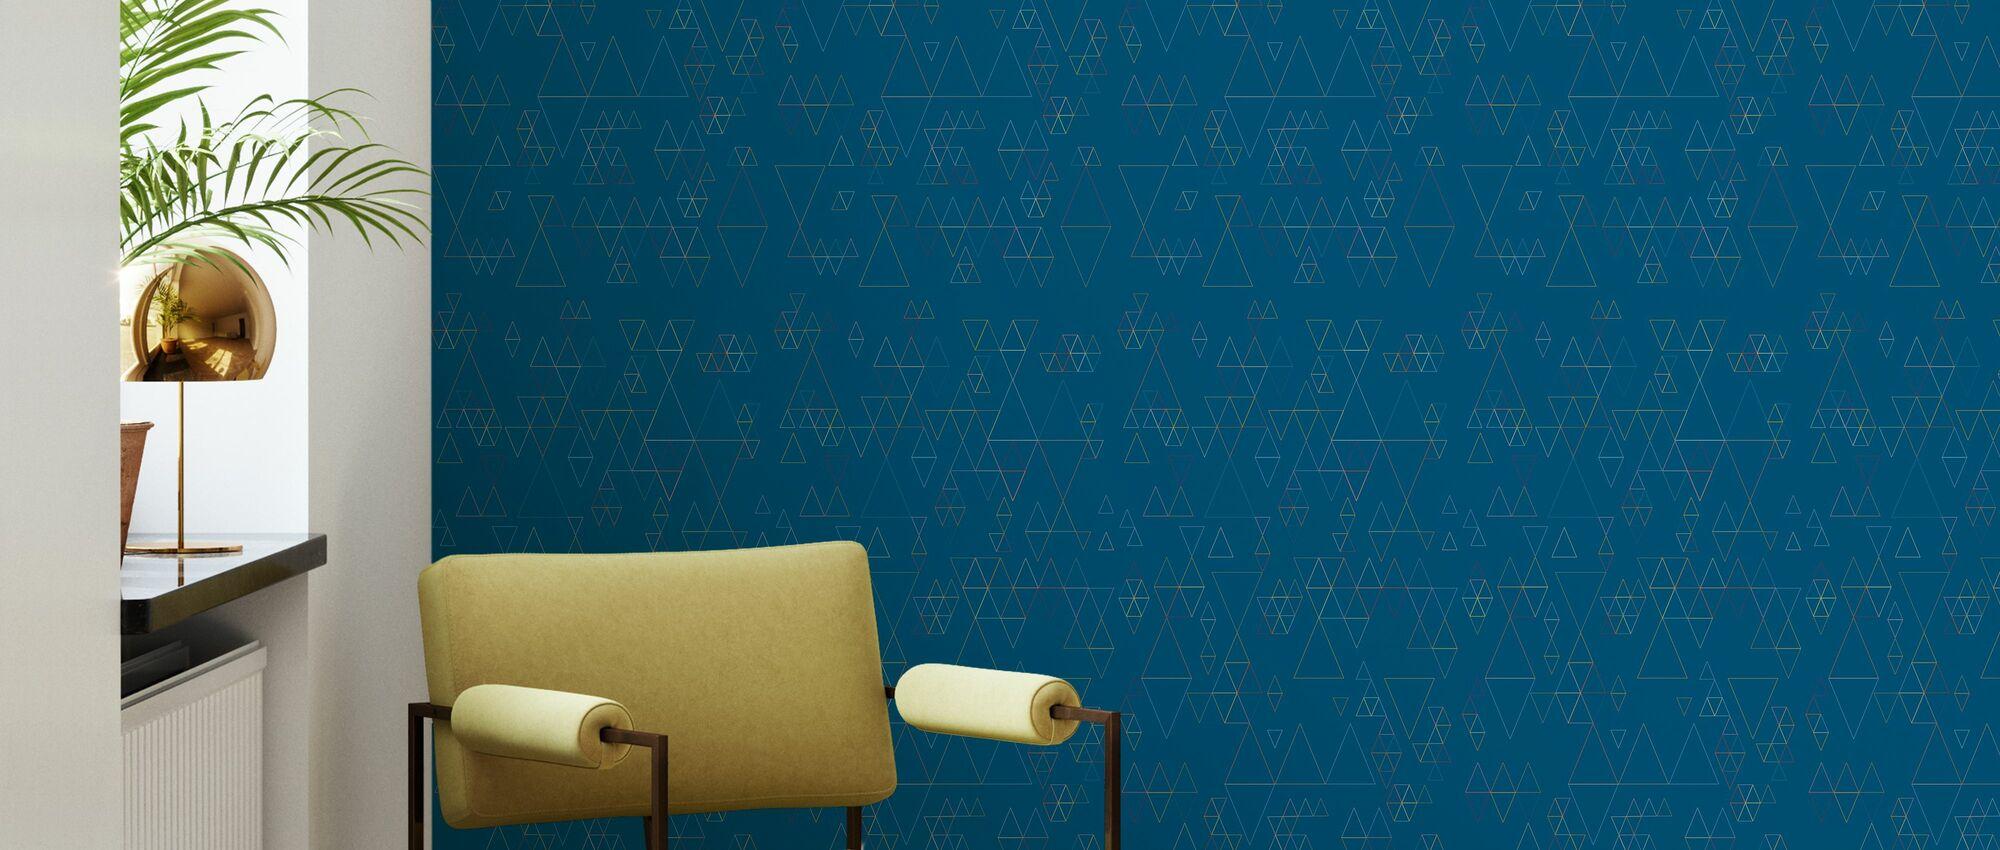 Retroline Blue - Wallpaper - Living Room